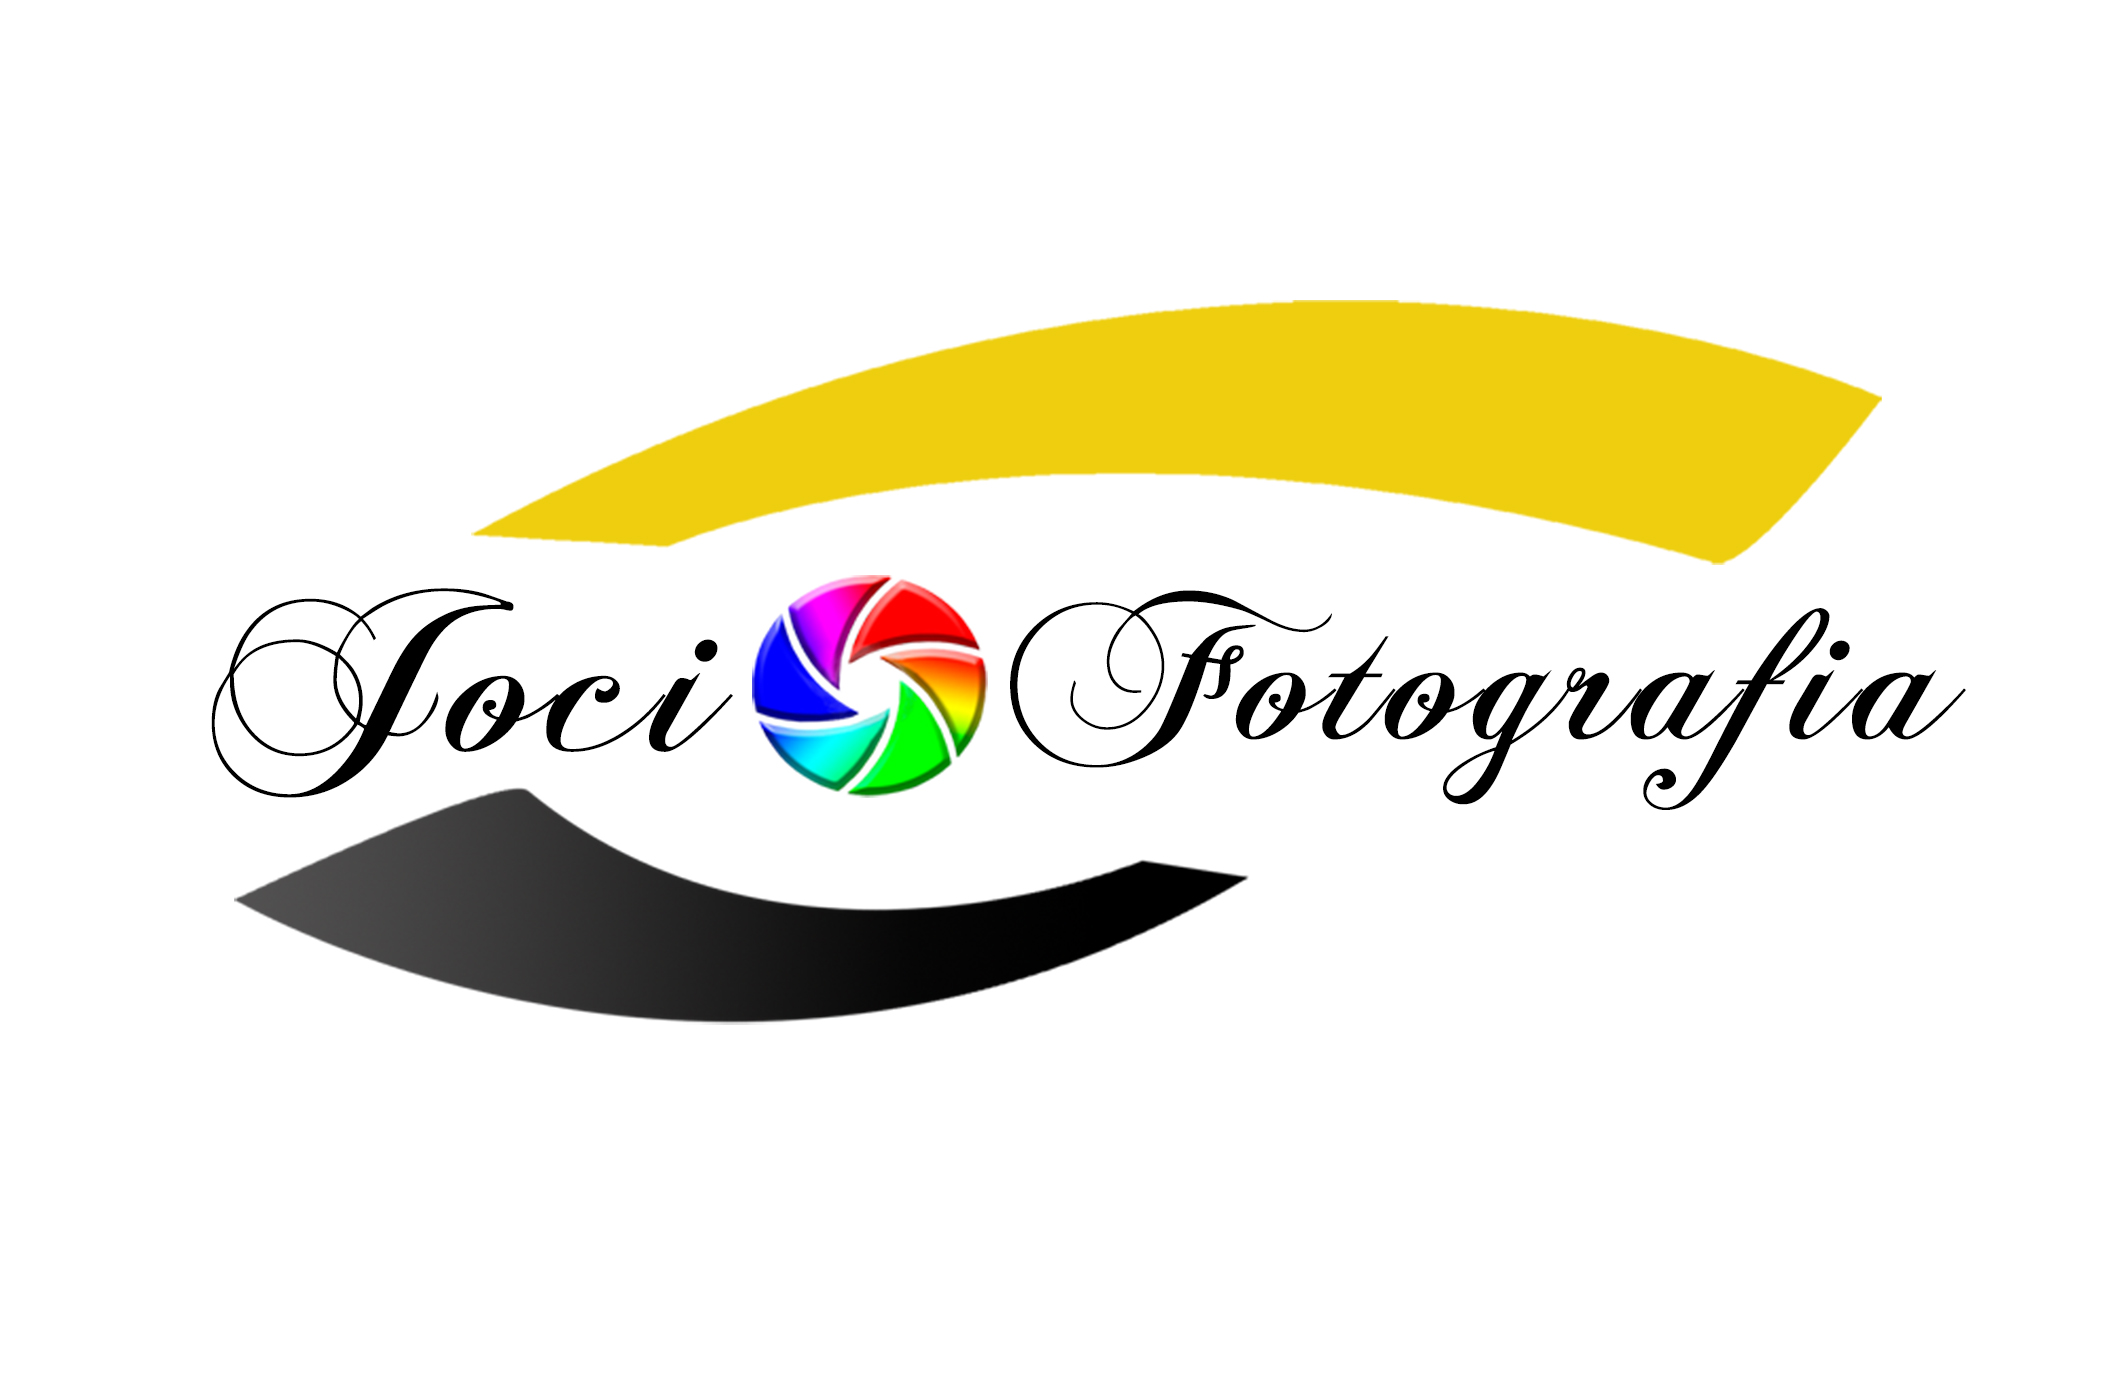 Contate JOCI FOTOGRAFIA